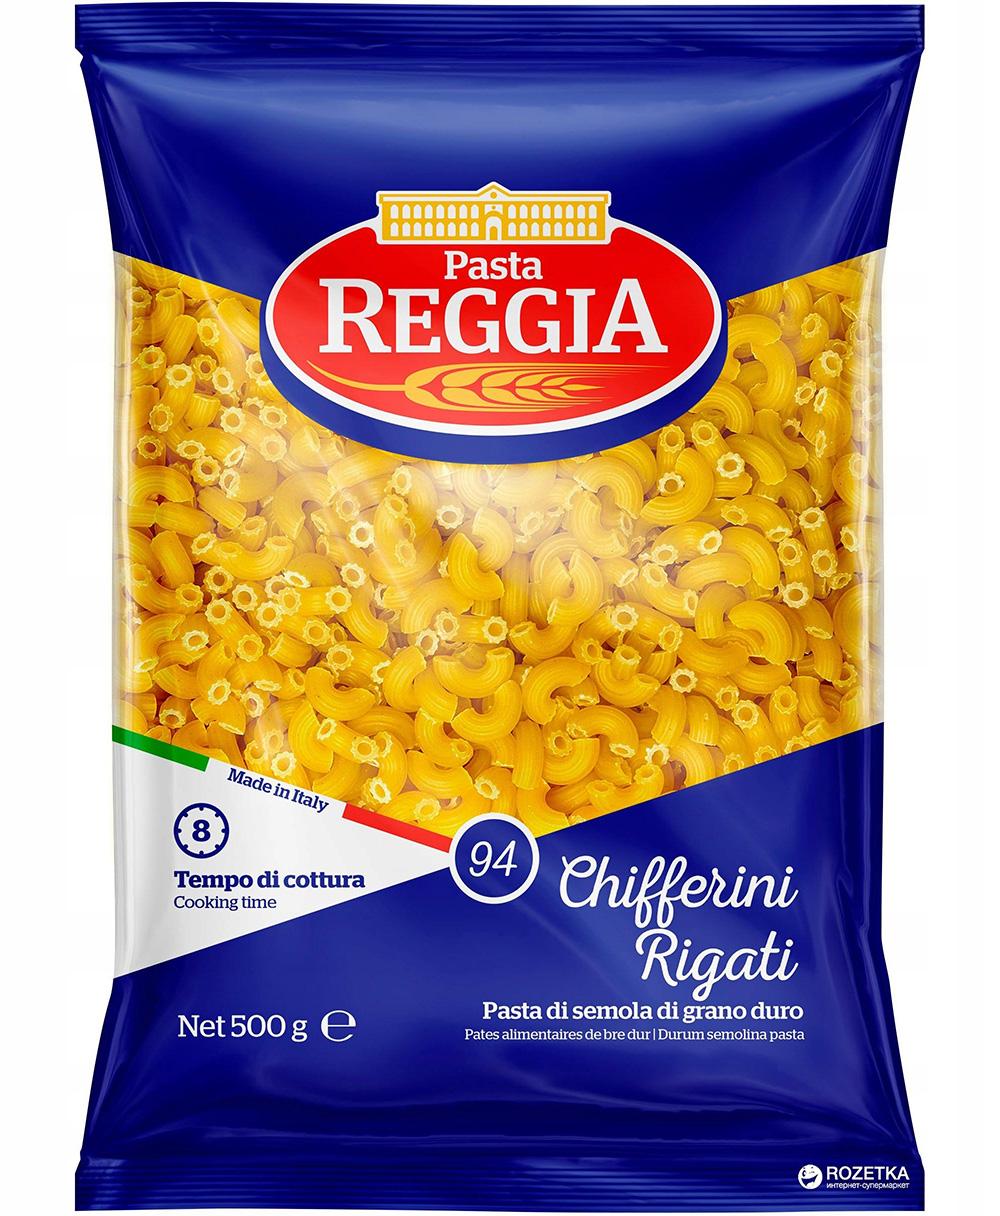 CHIFFERINI RIGATI PASTA 500g Колено Reggia